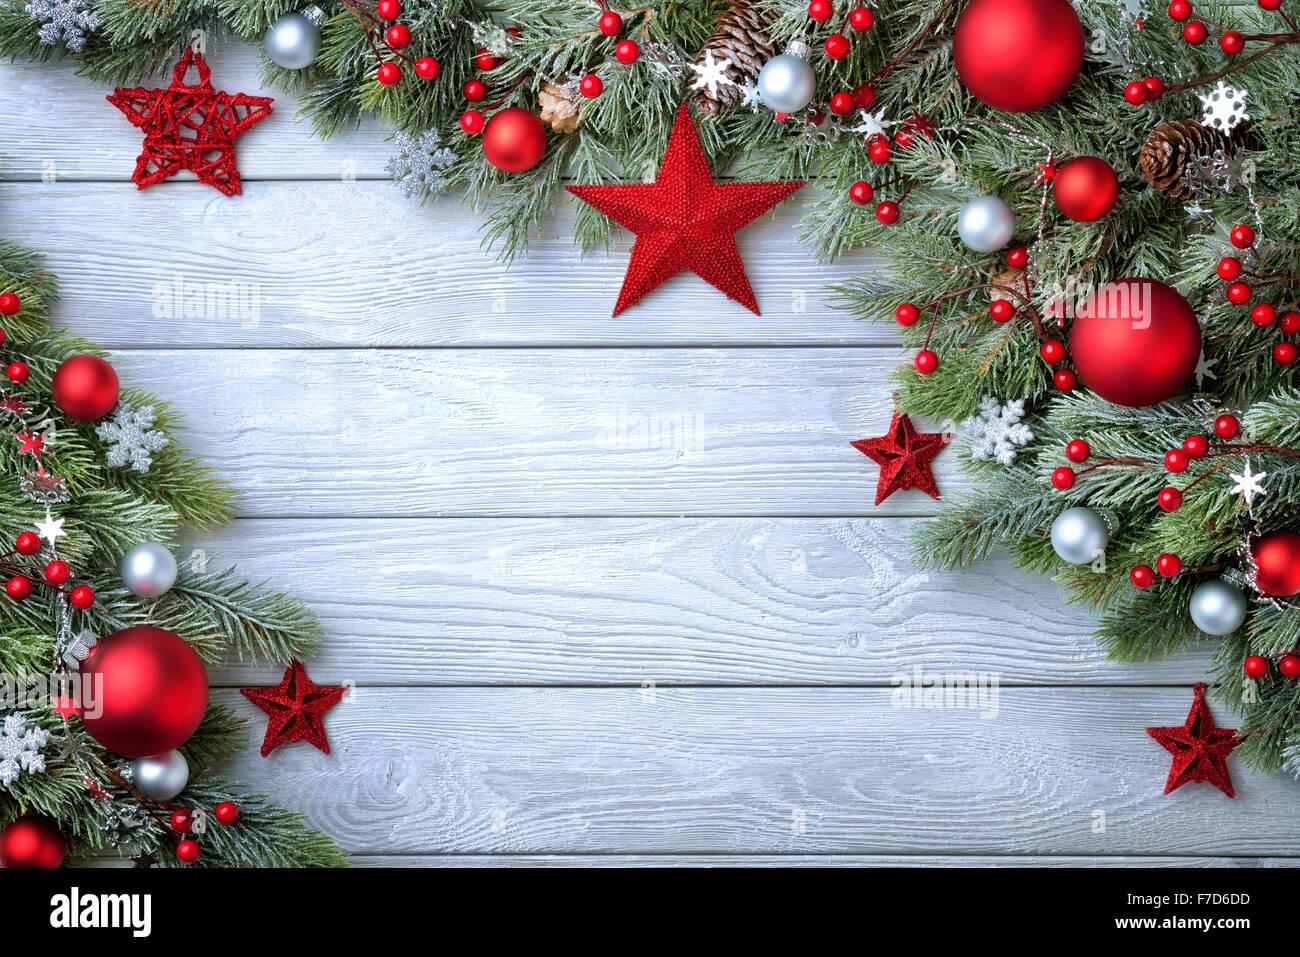 Advent arrangement mistletoe christmas baubles stockfotos for Weihnachten modern